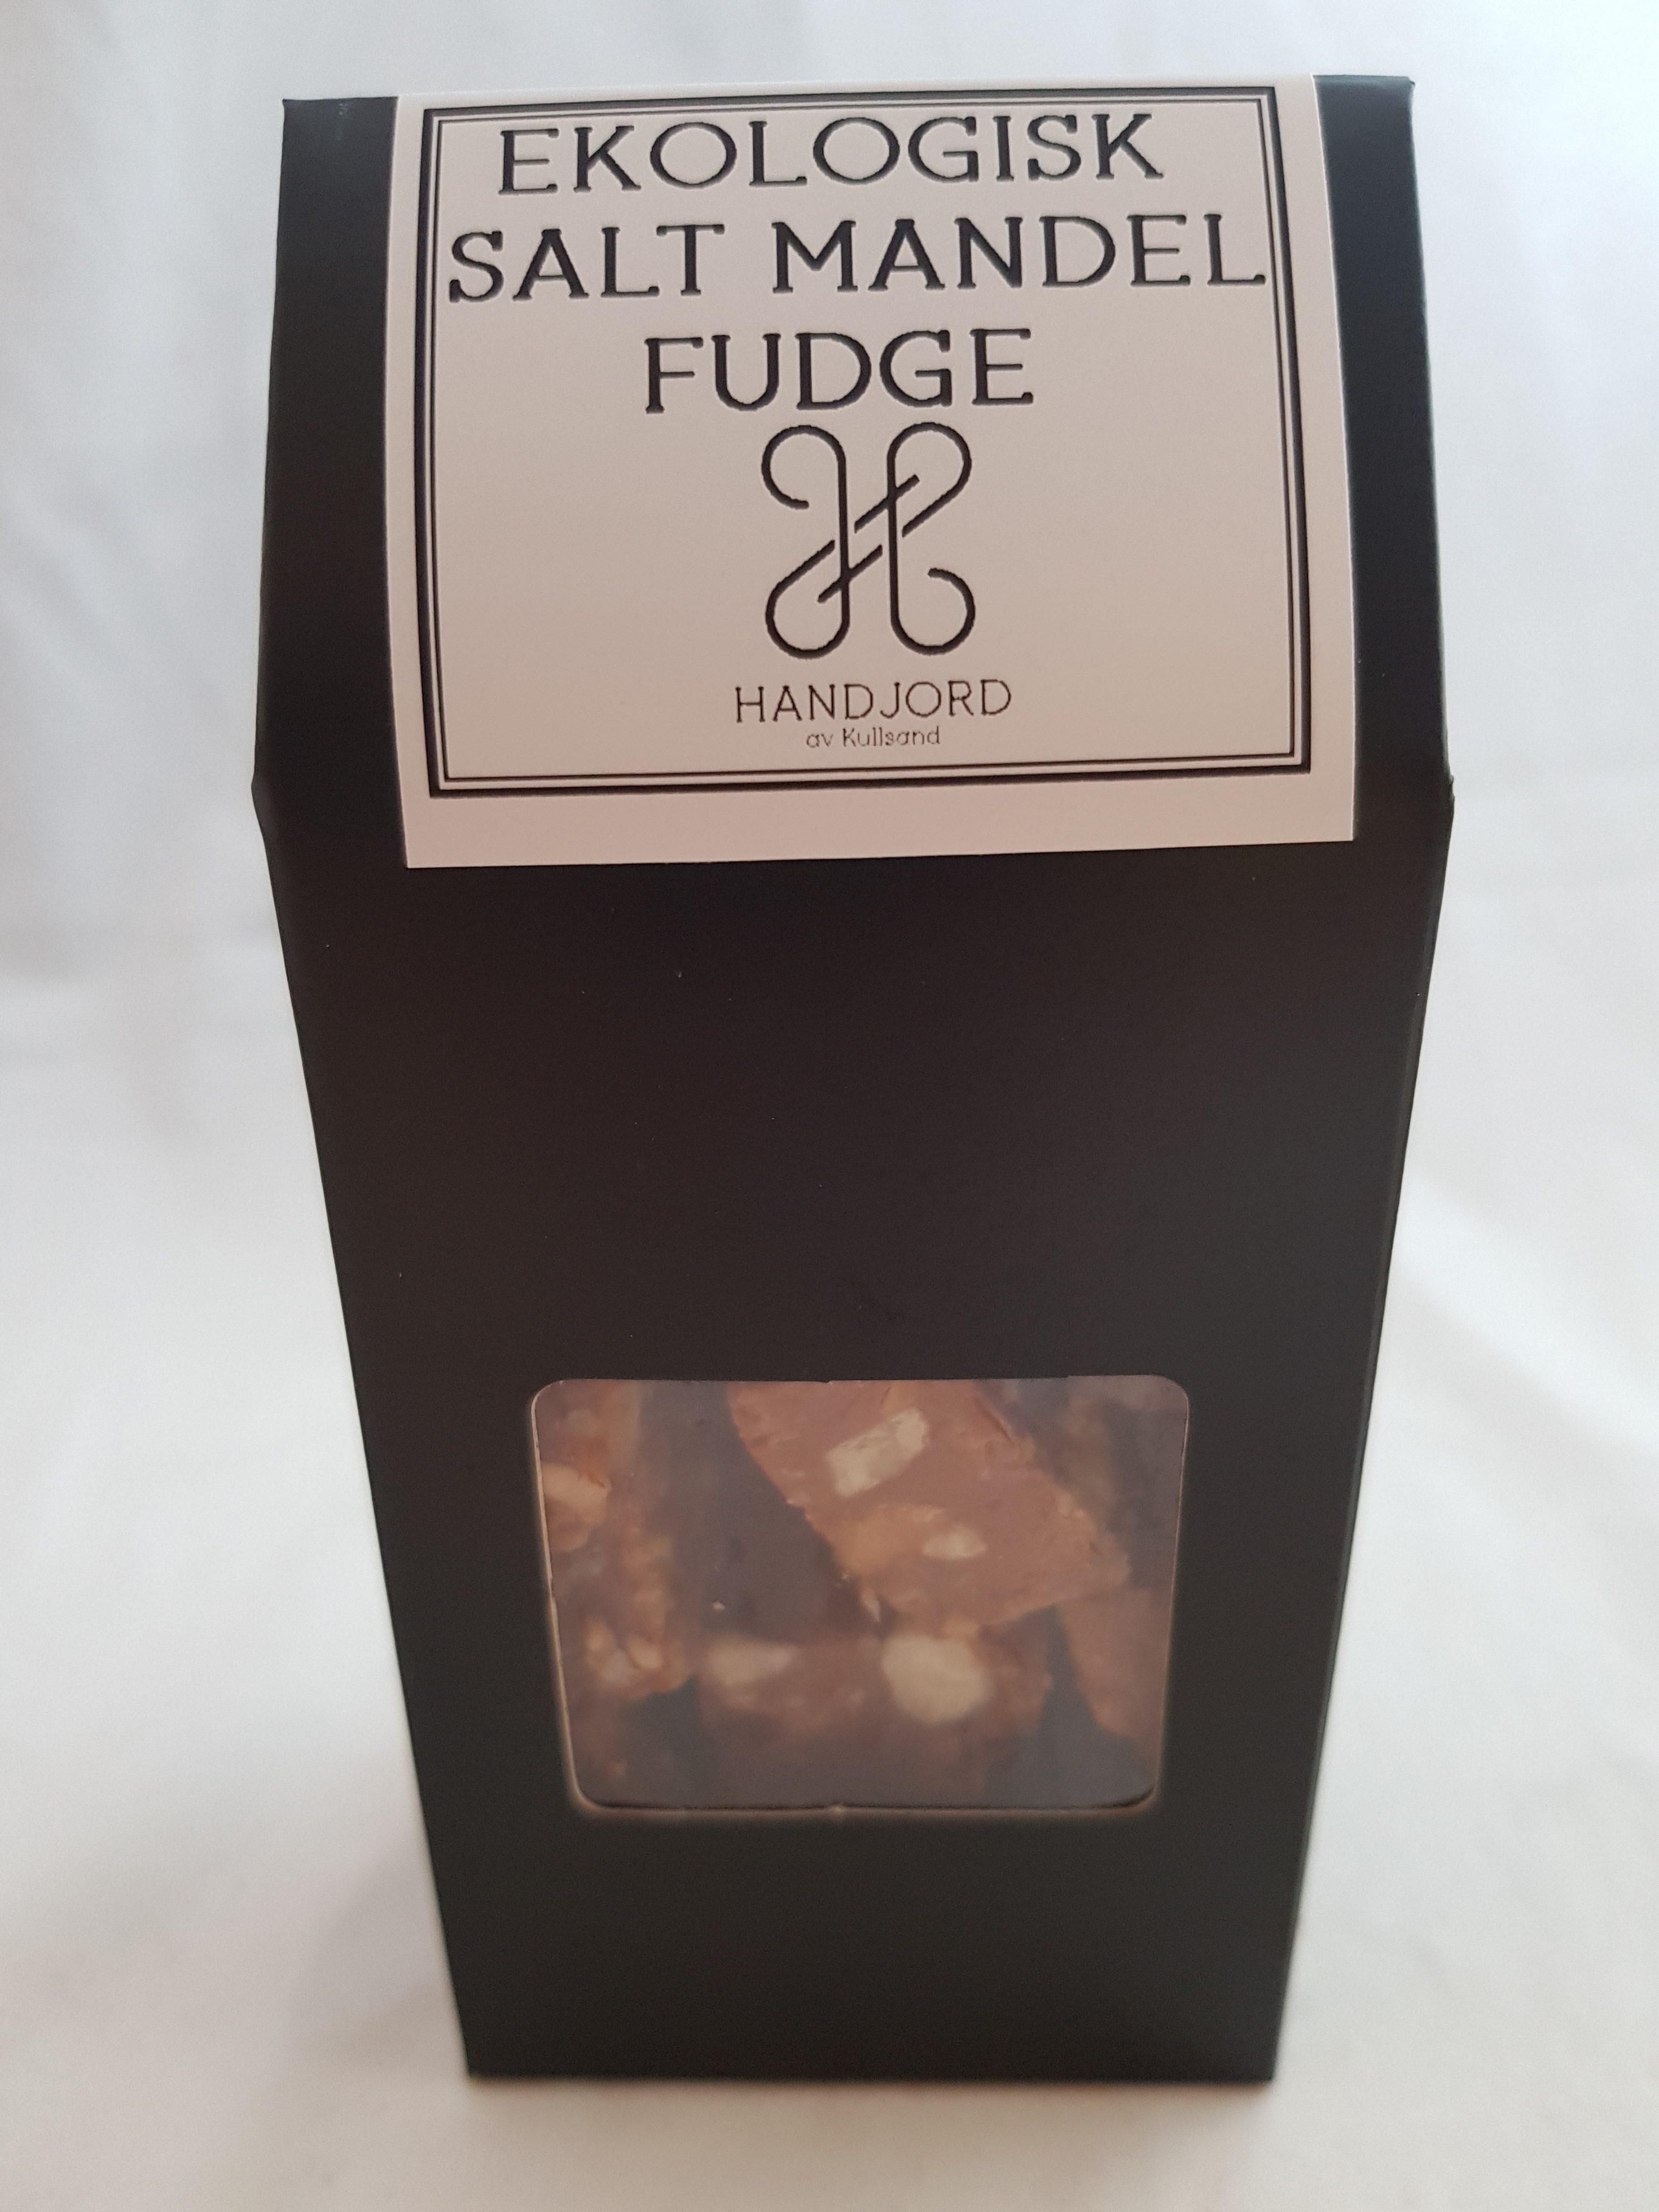 Ekologisk Fudge Salt Mandel